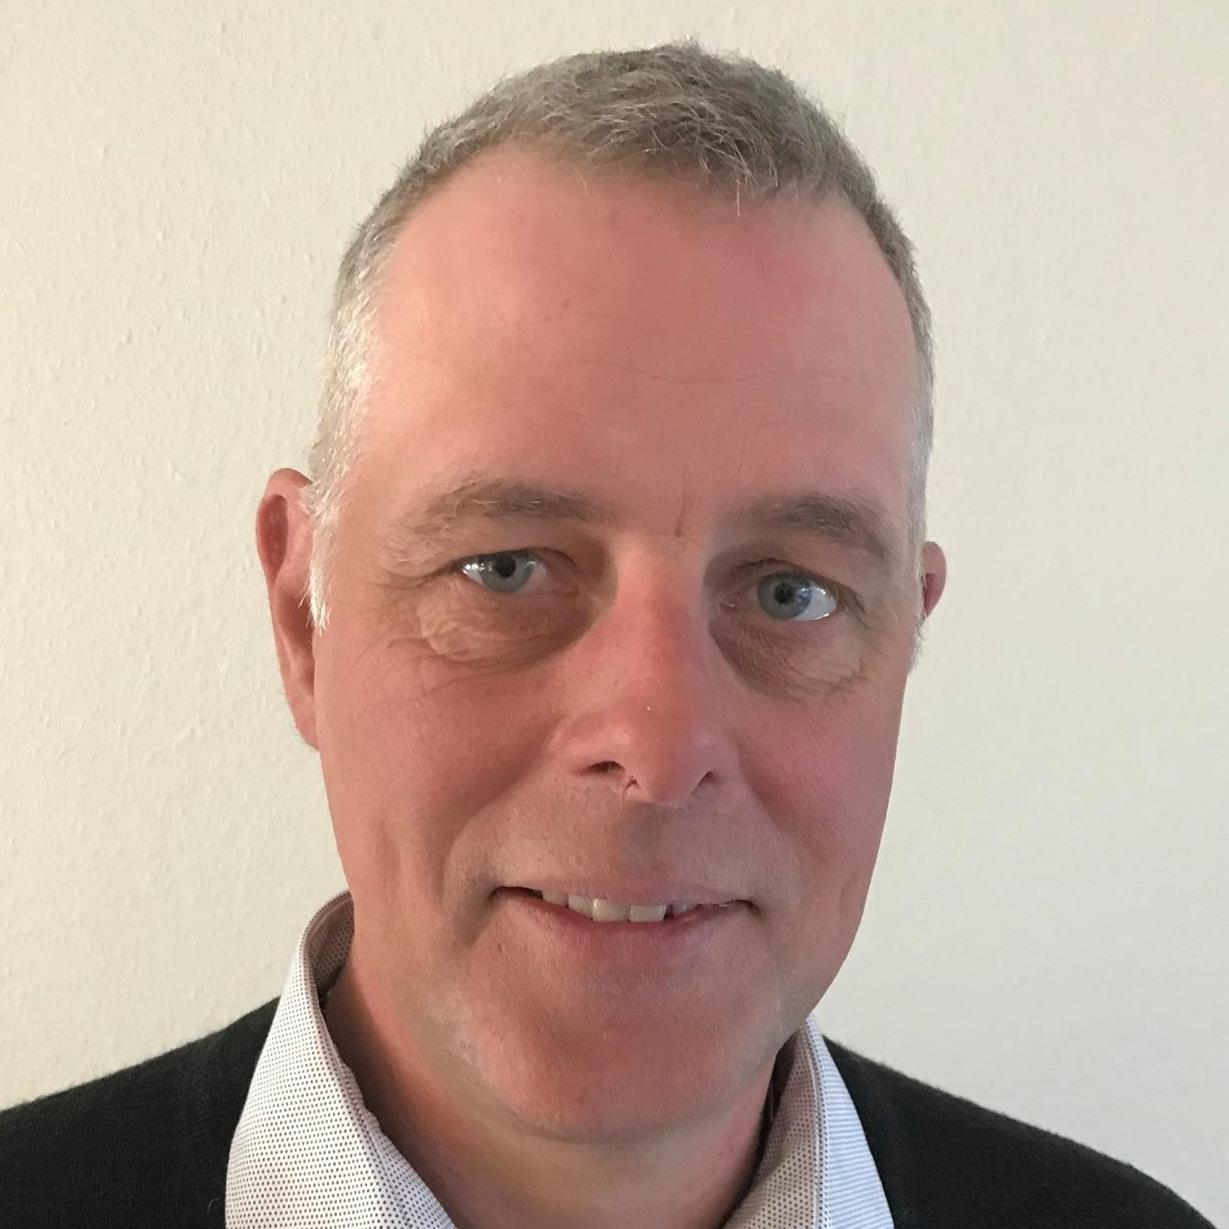 Claus Kærgaard